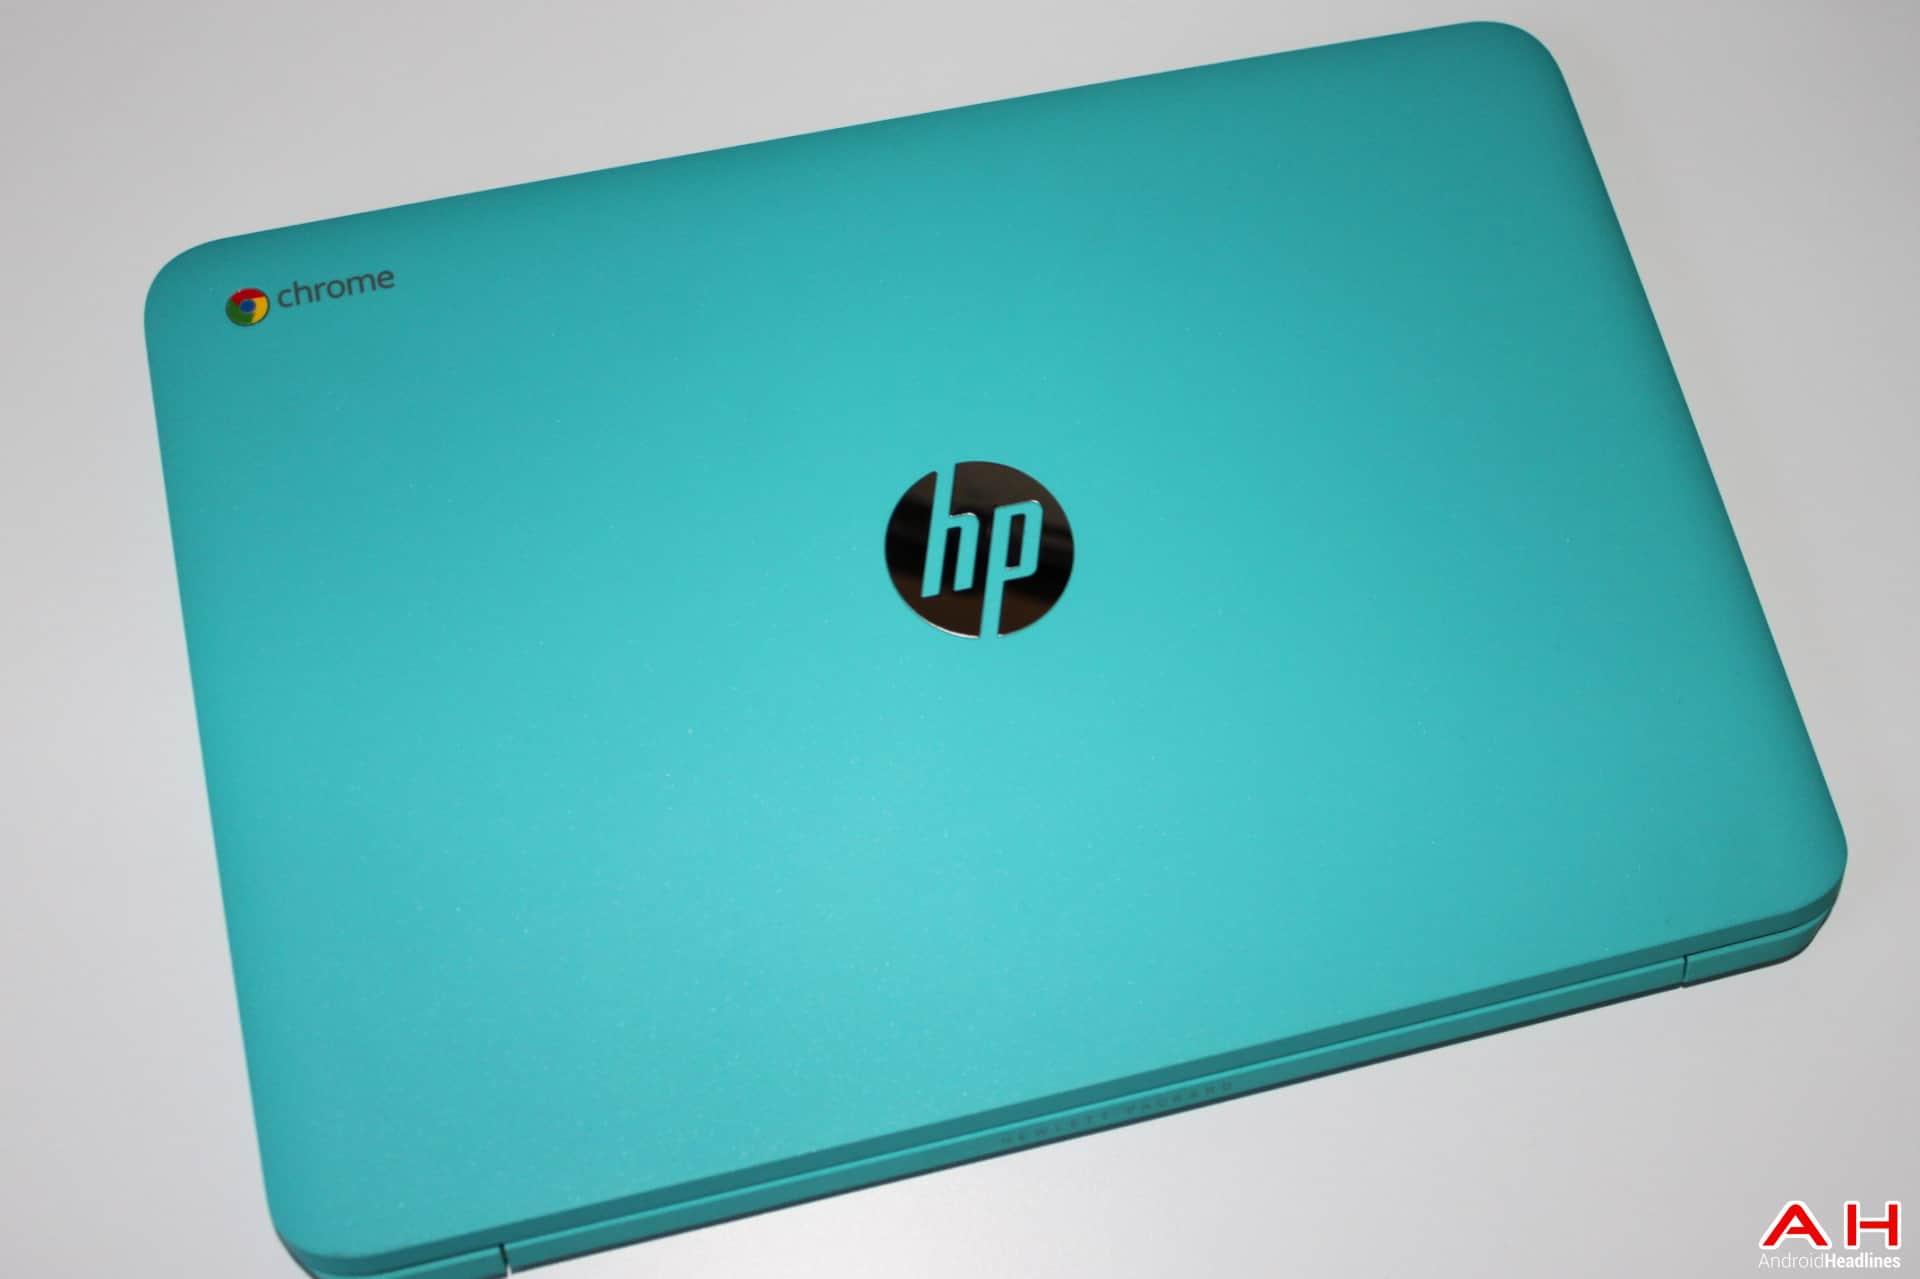 AH HP Chrome Chromebook 14-1